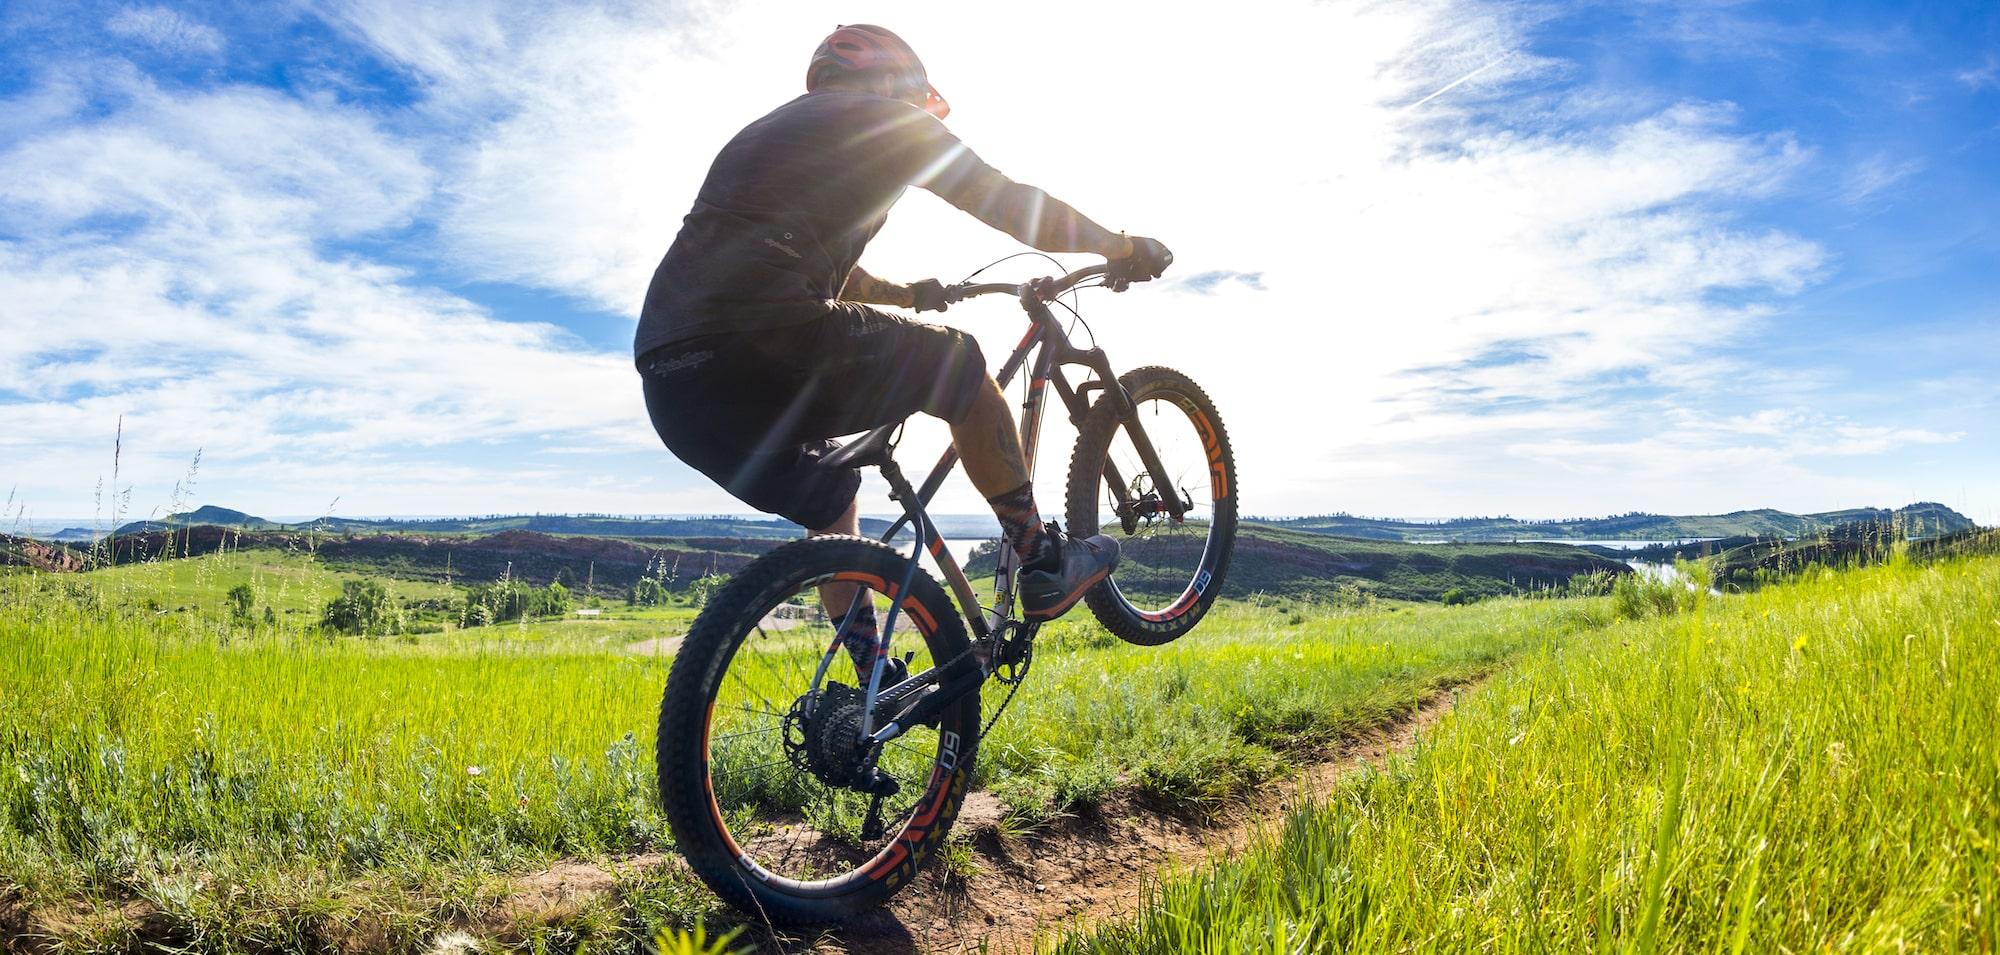 Niner SIR 9 Trail Bike